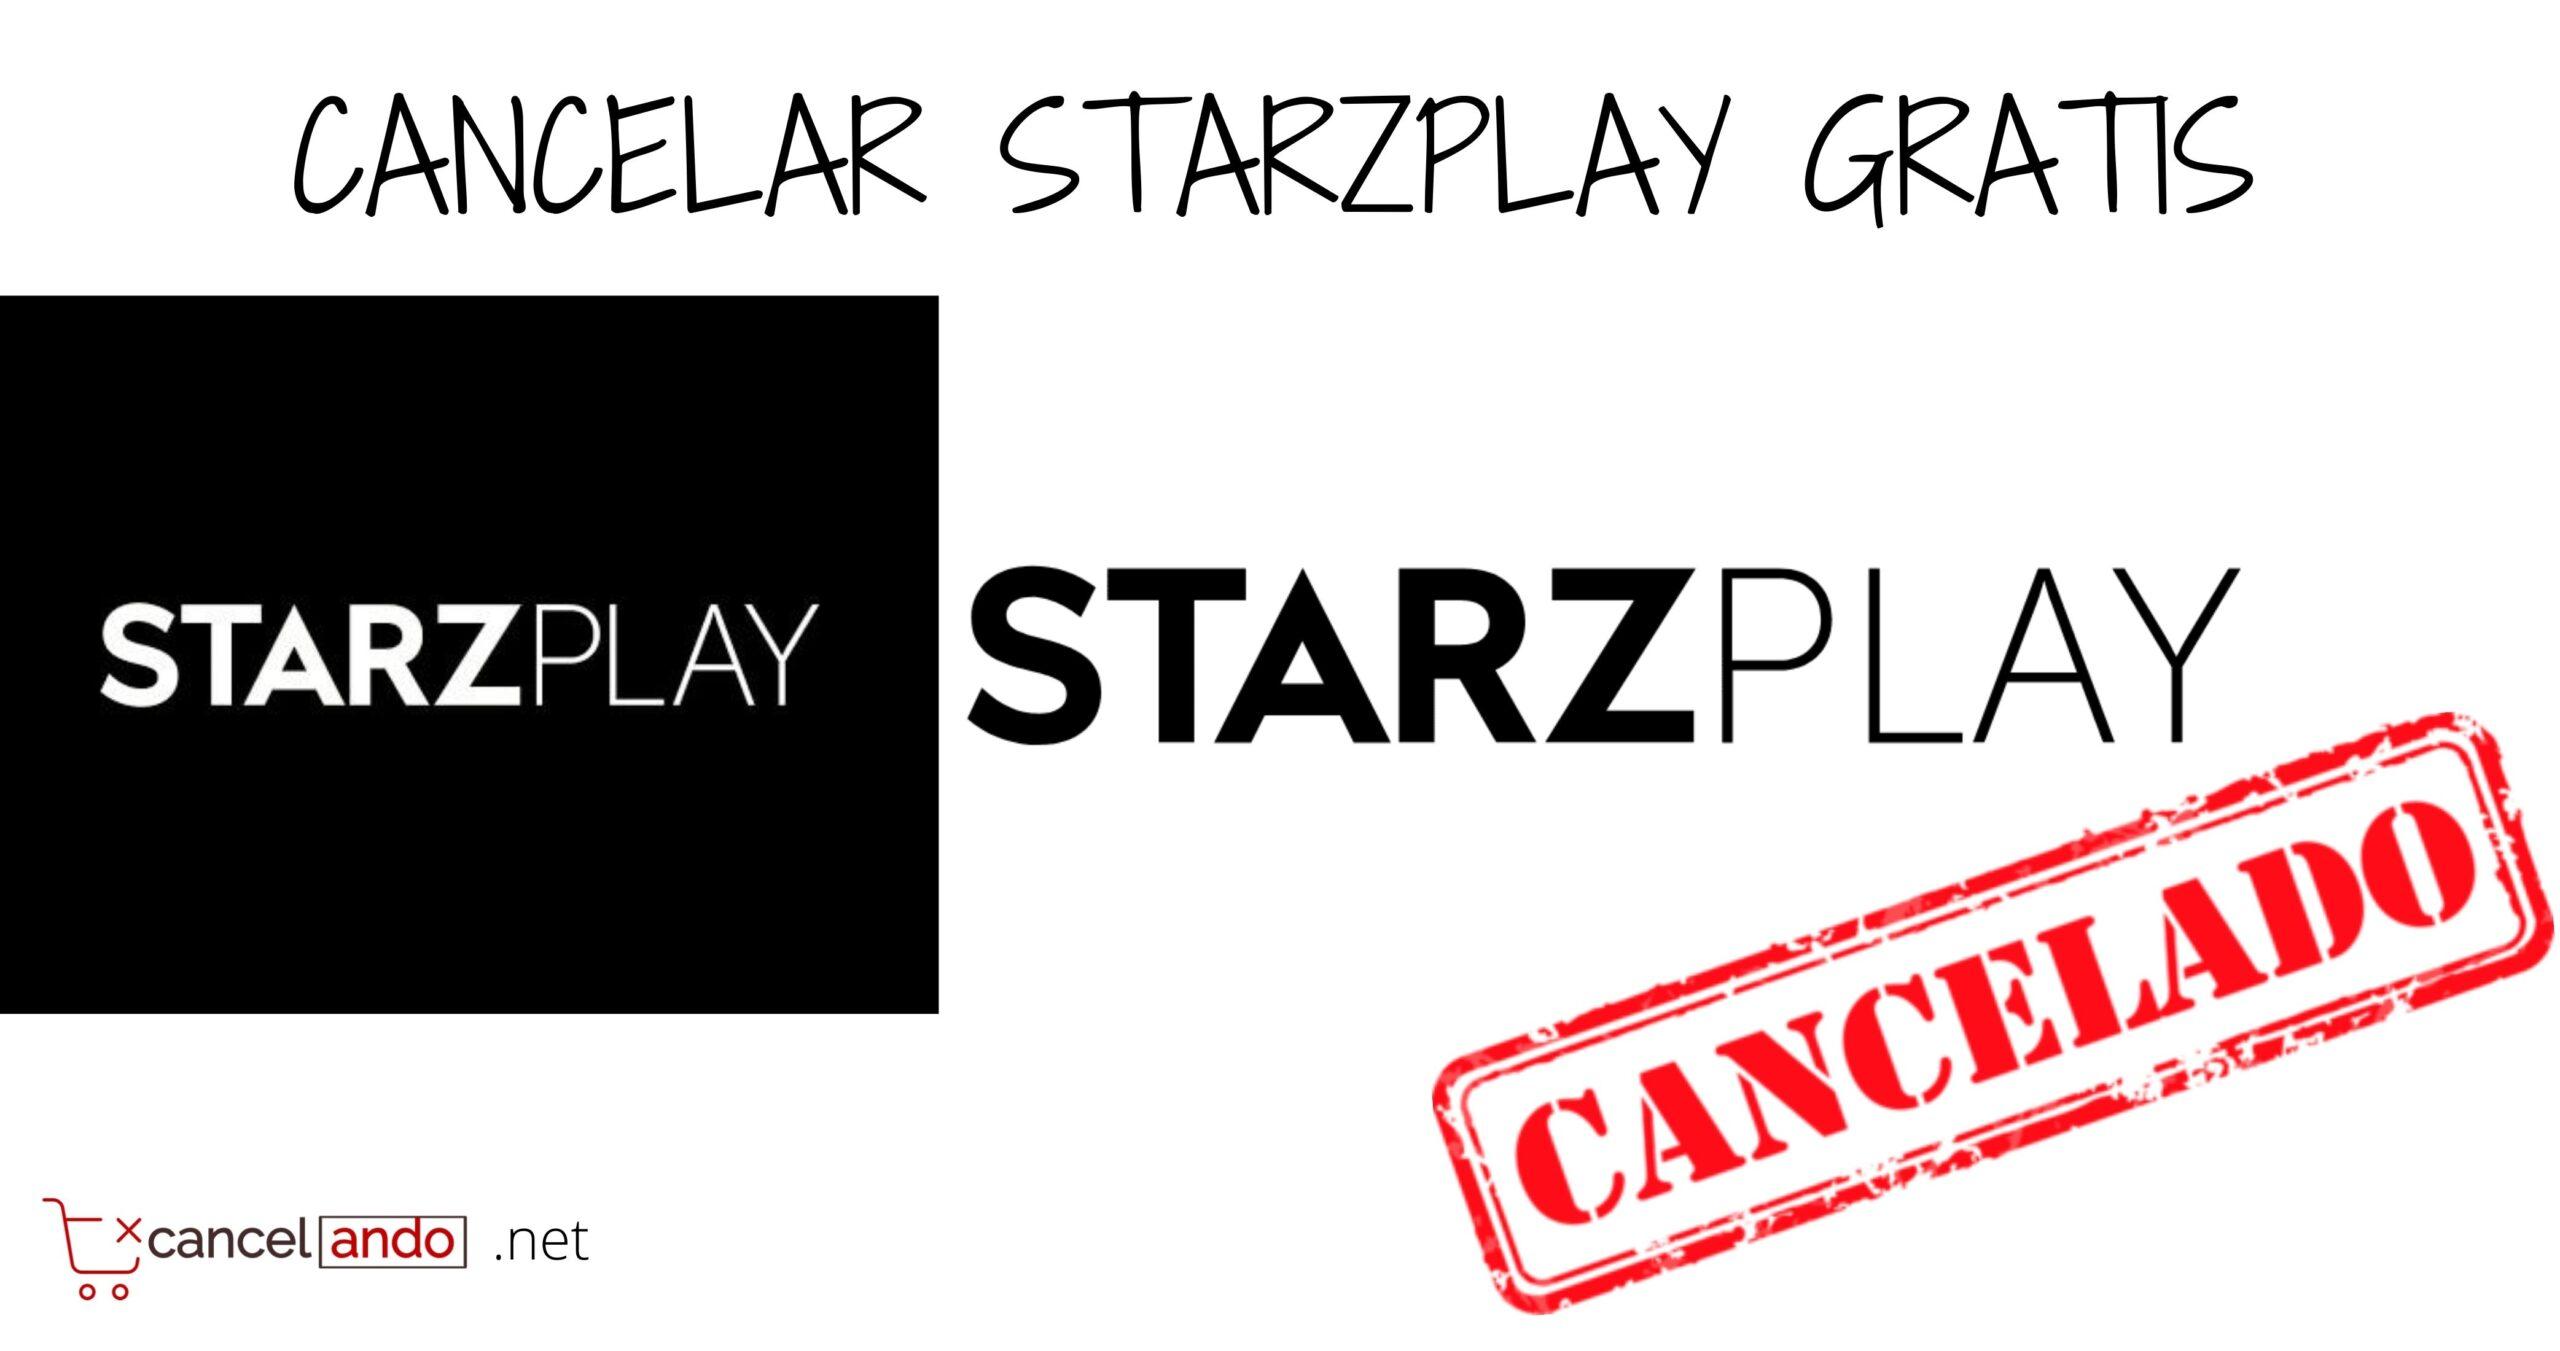 cancelar starzplay